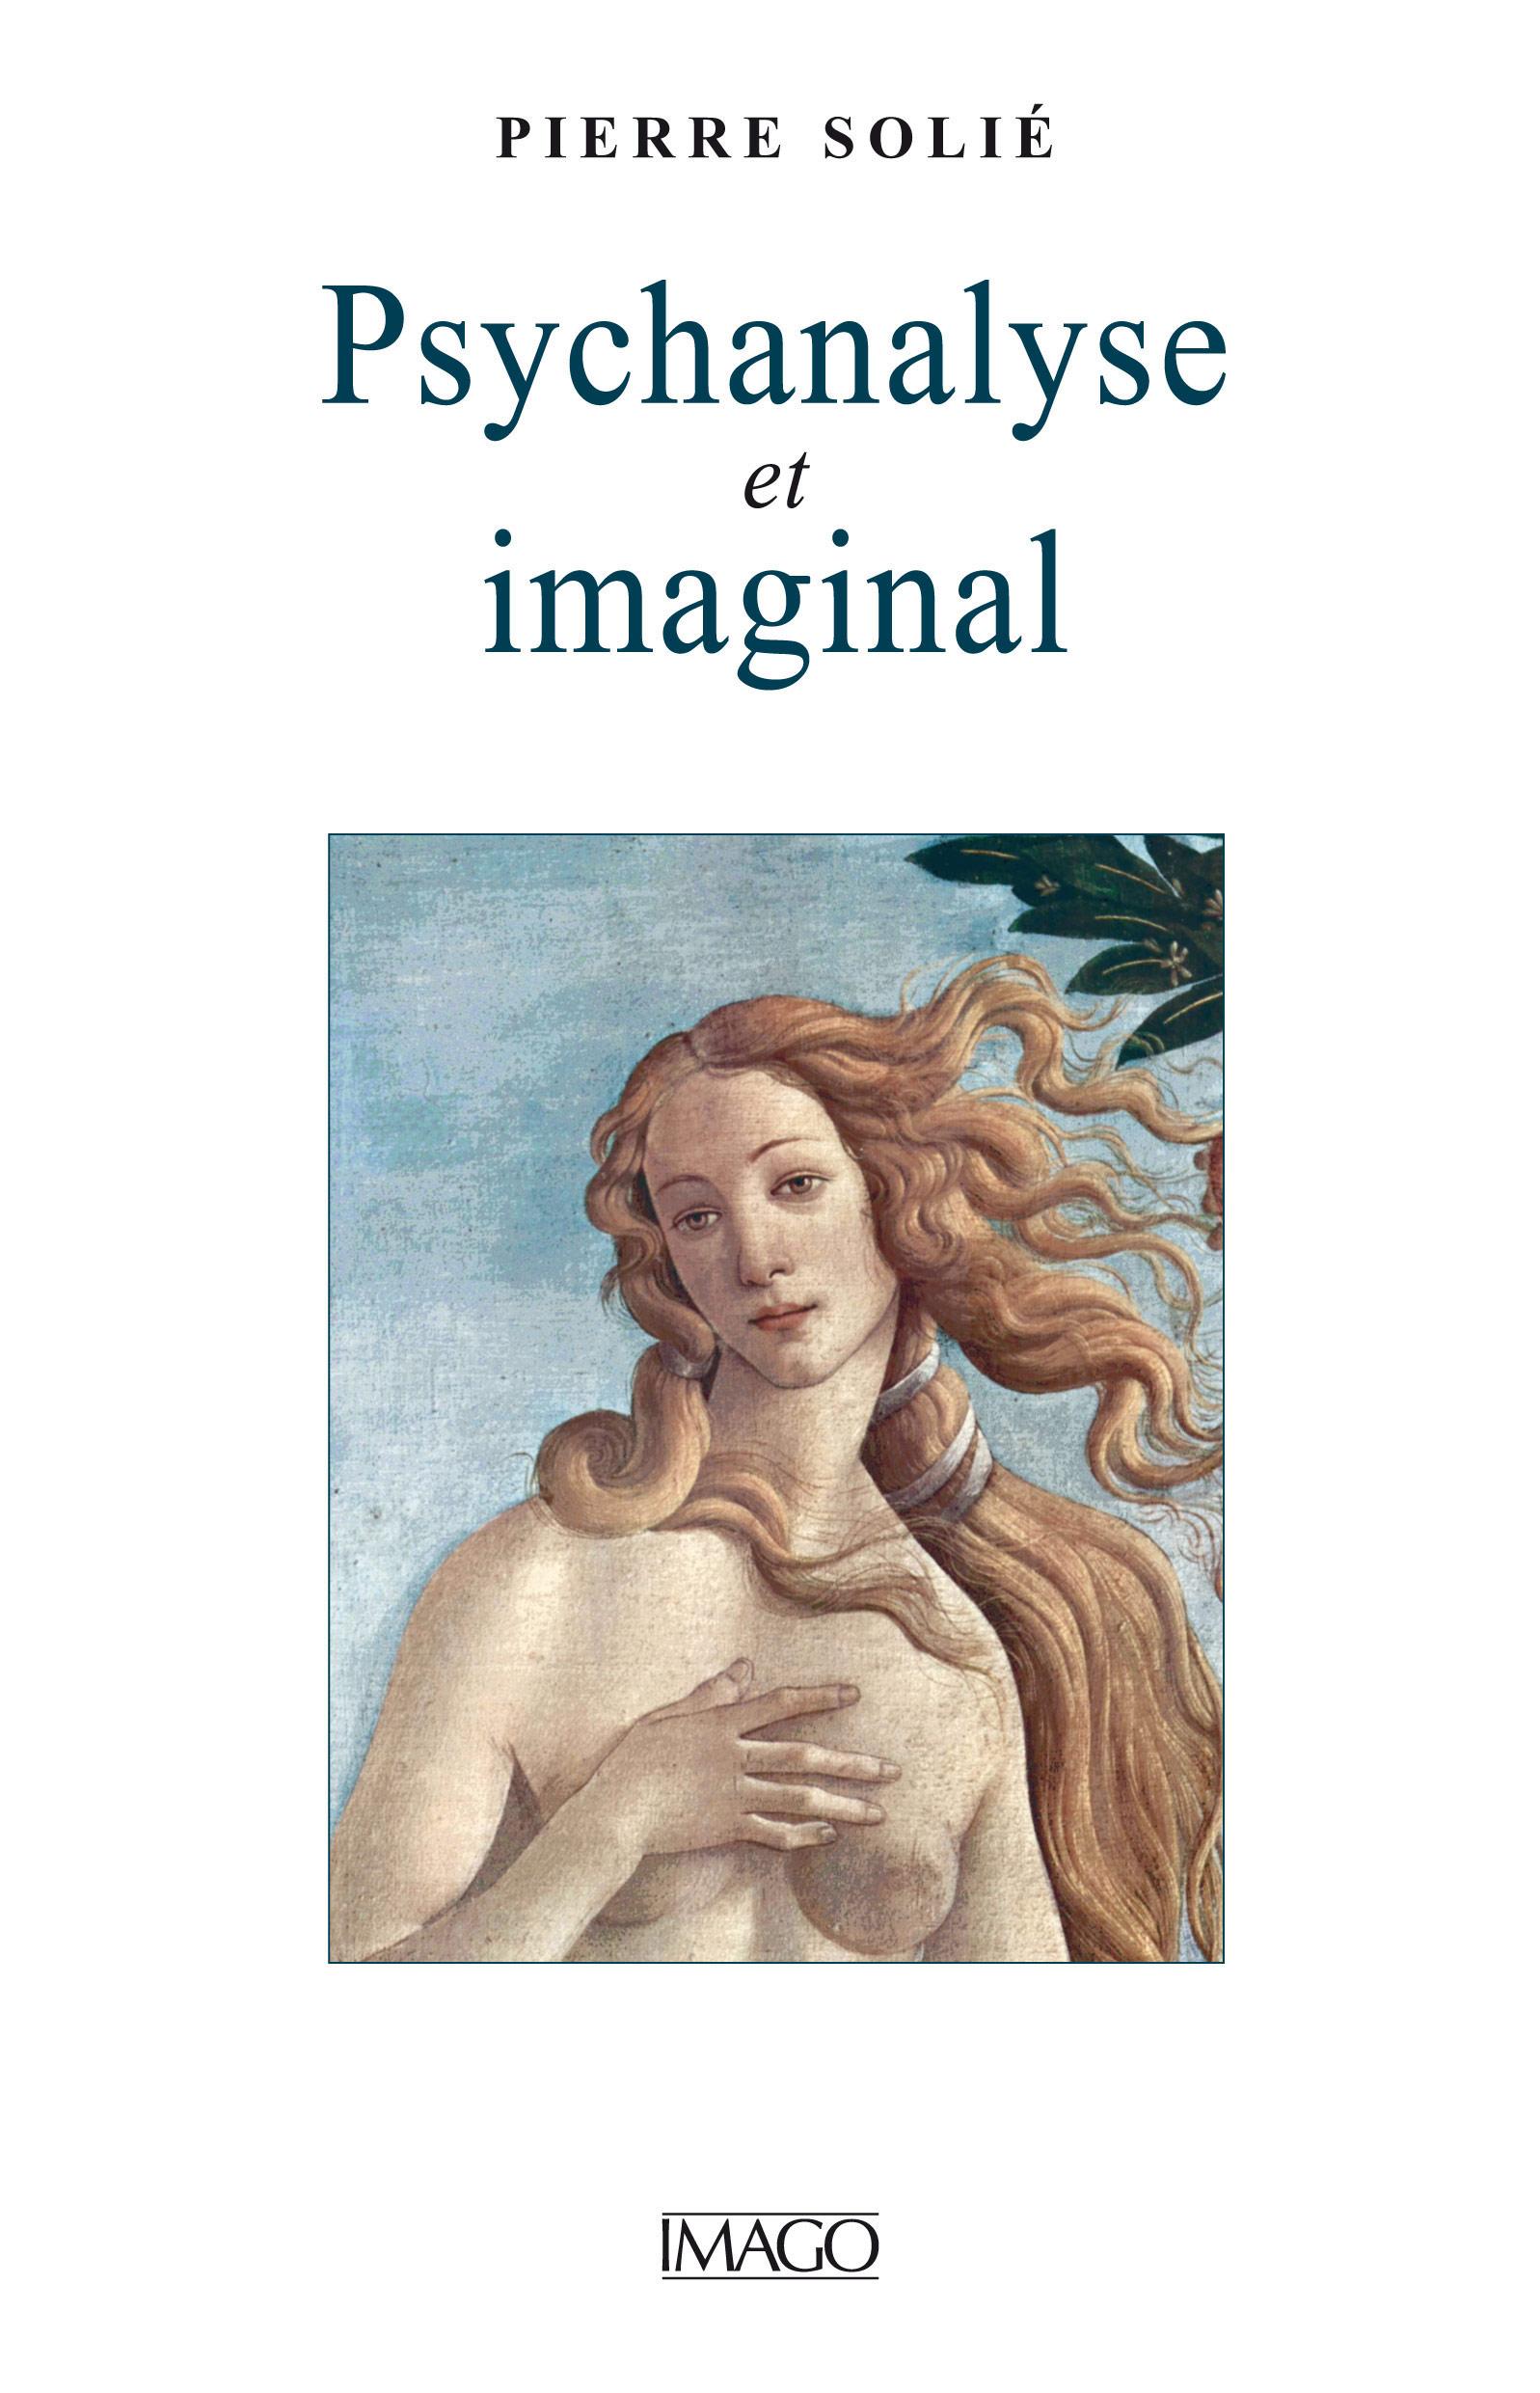 Psychanalyse et Imaginal